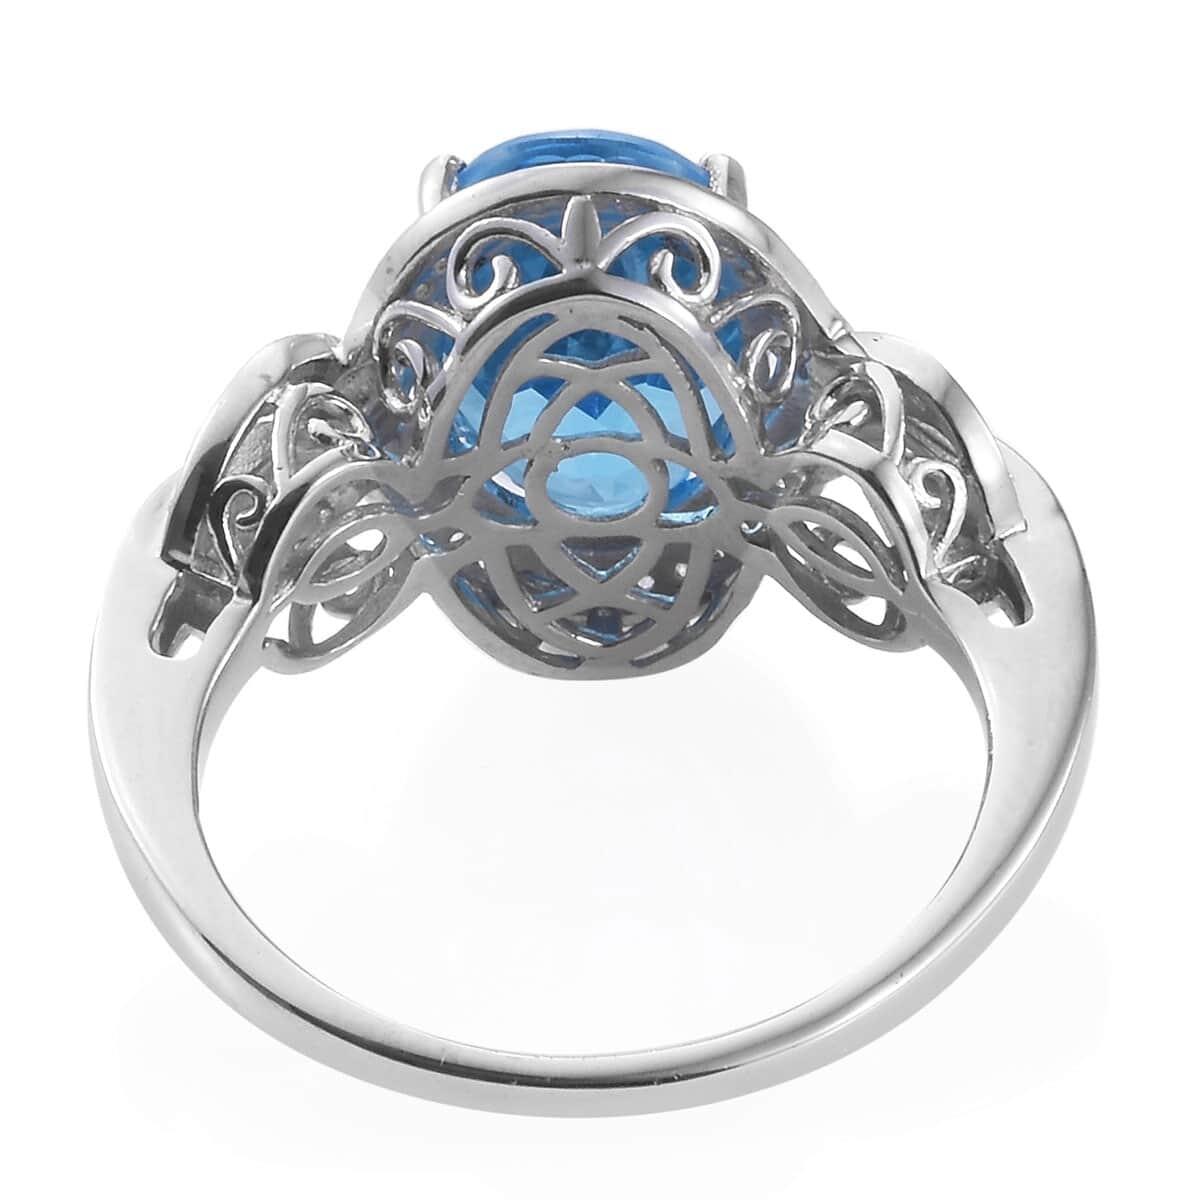 Marambaia Topaz, Cambodian Zircon Ring in Platinum Over Sterling Silver (Size 8.0) 8.15 ctw